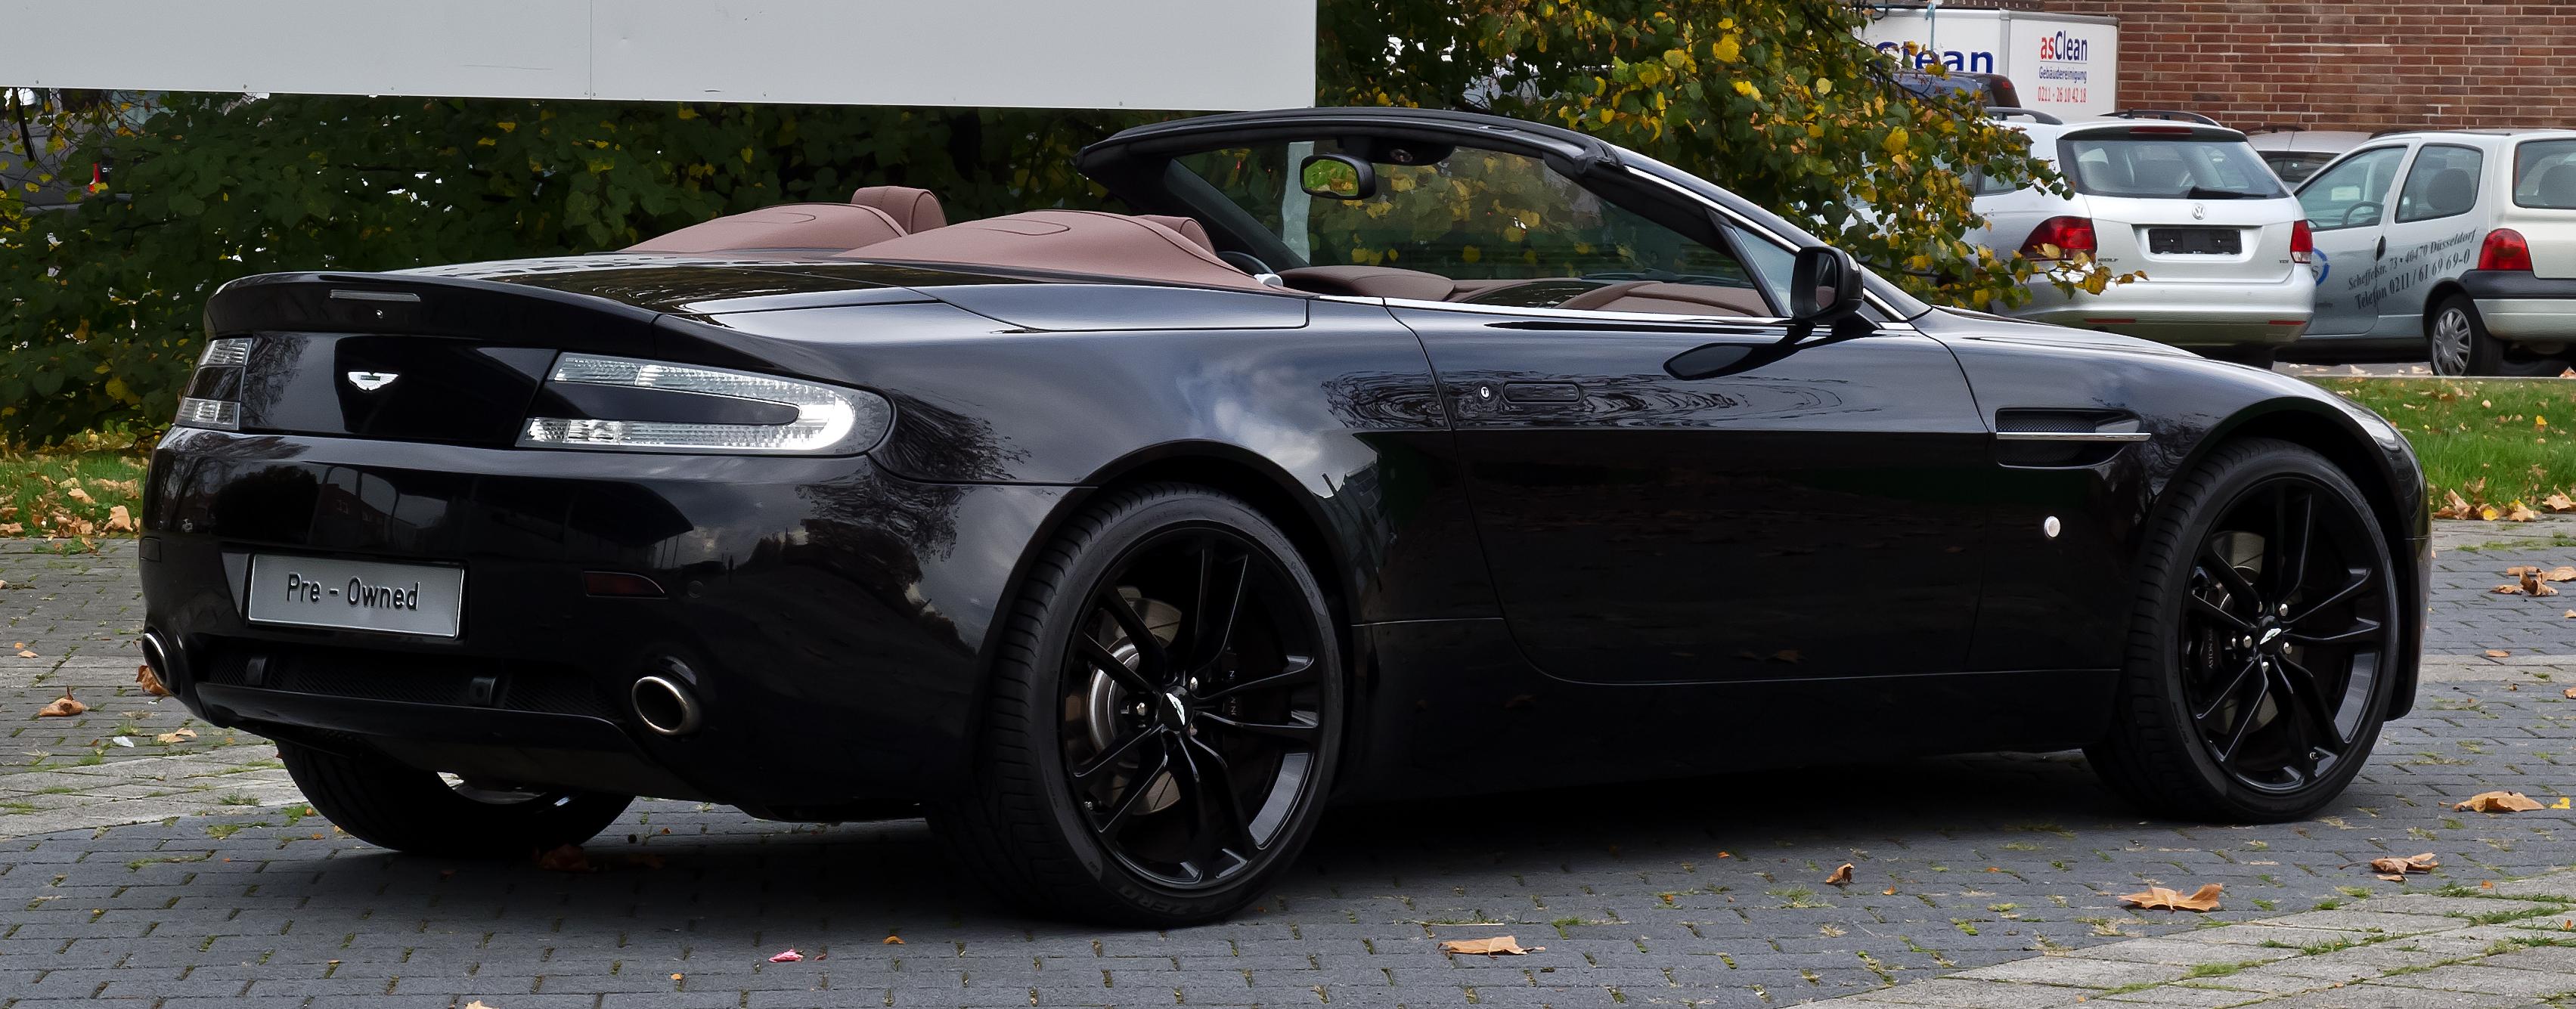 File:Aston Martin V8 Vantage Roadster (Facelift) – Heckansicht, 26. Oktober 2012, Düsseldorf.jpg ...